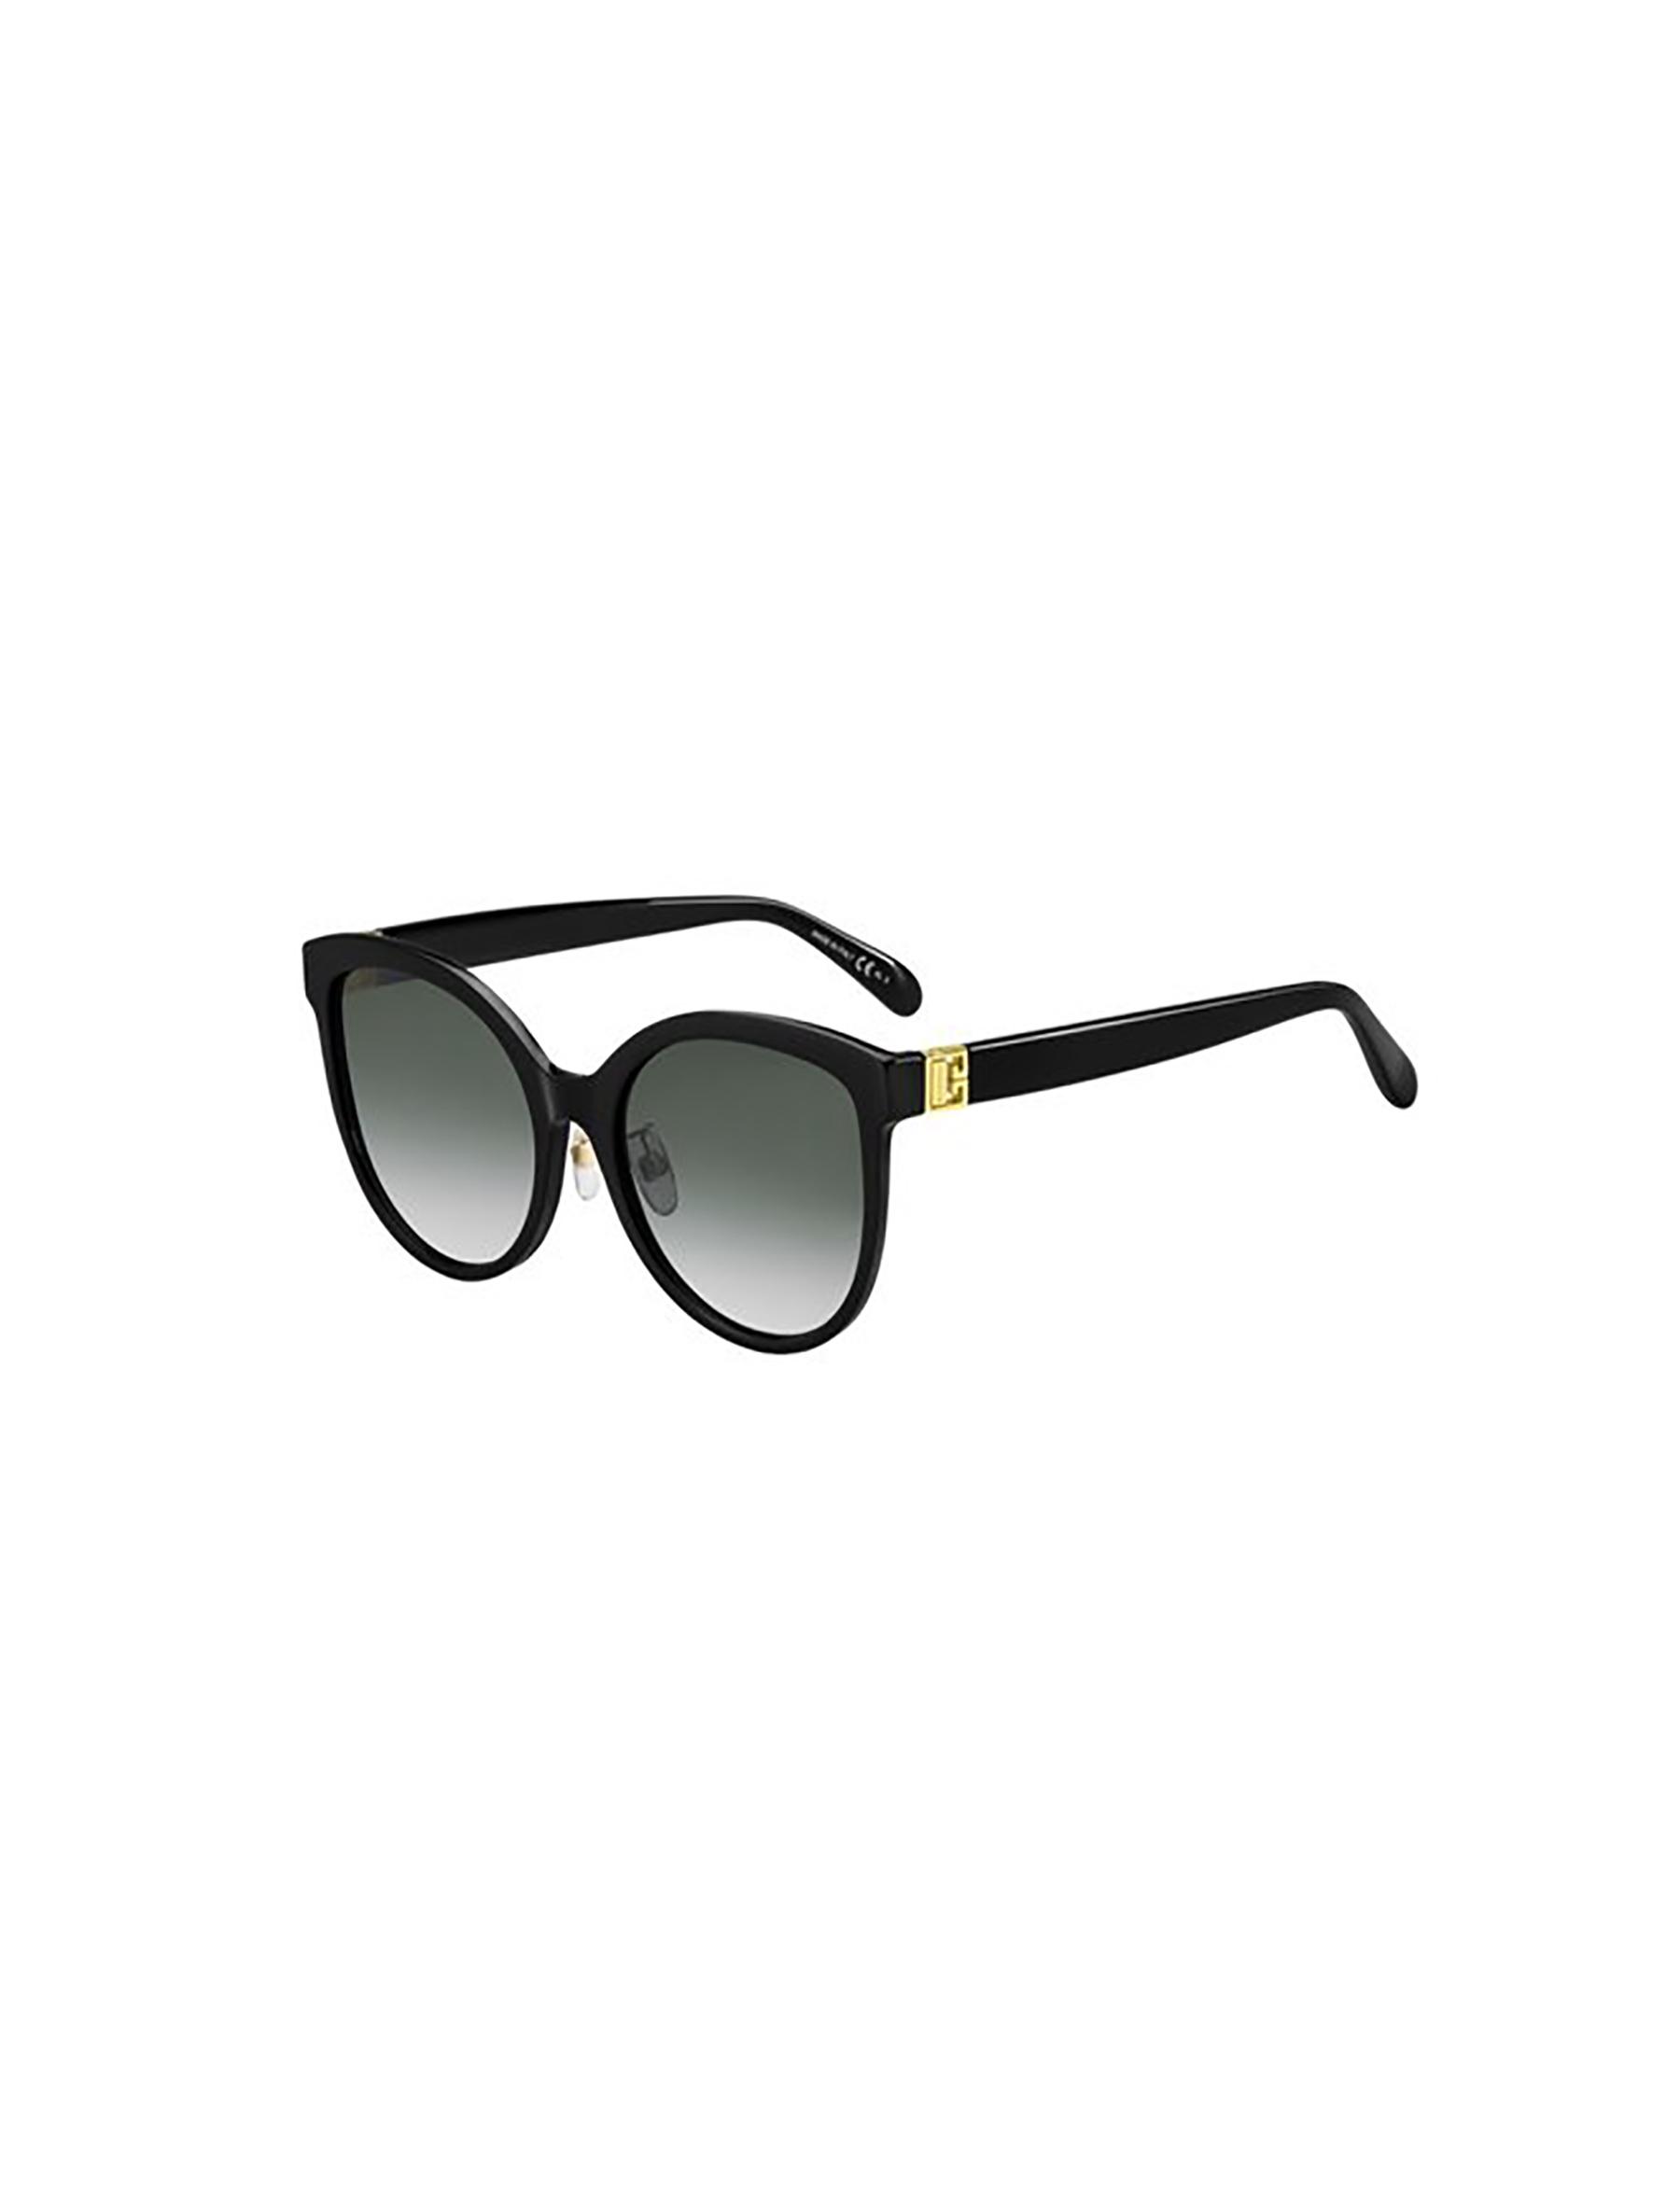 Givenchy Black Cat Eye Women's Sunglasses